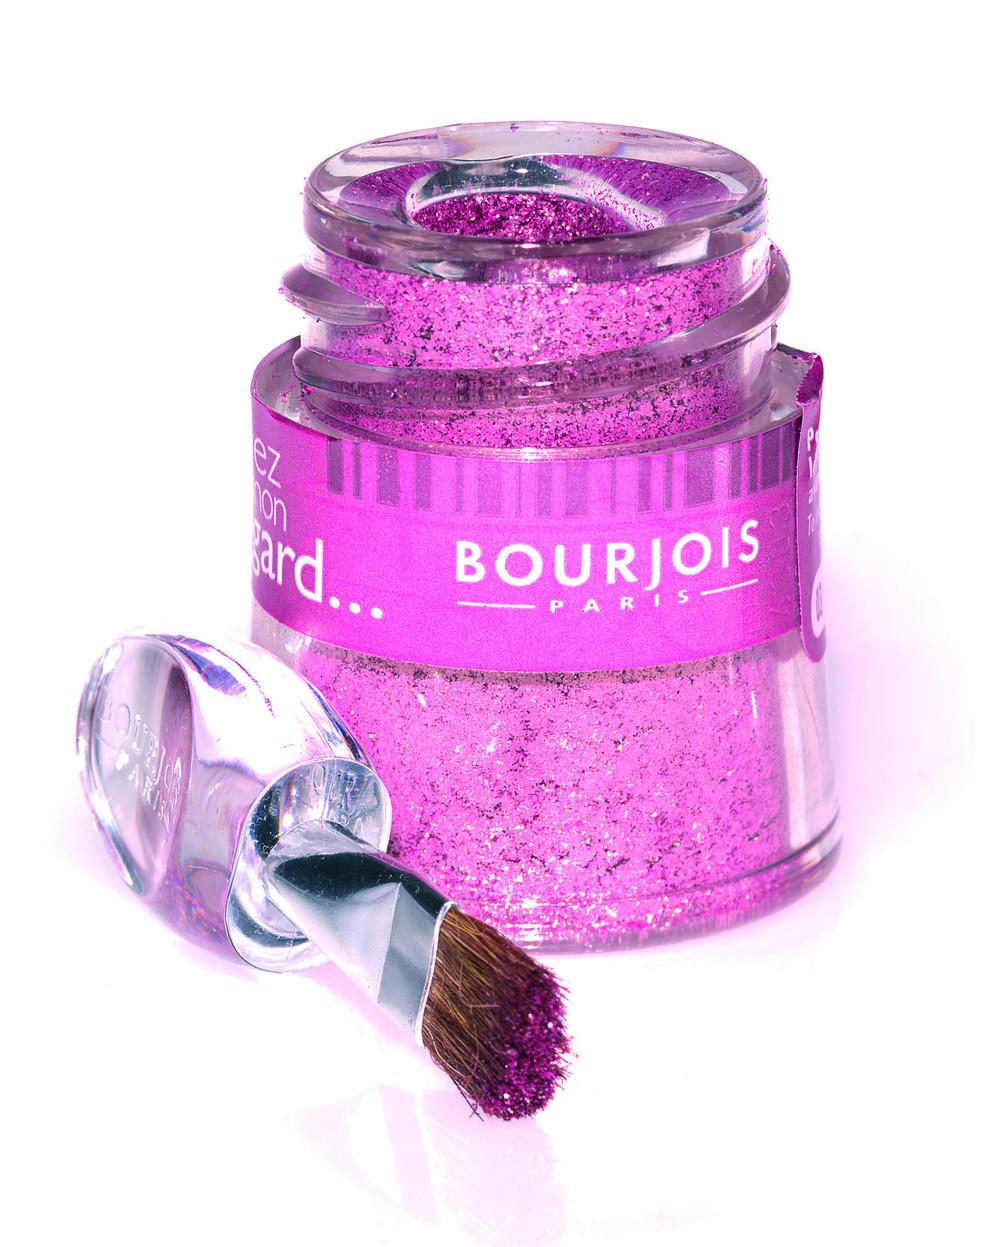 bourjois pot_b smaller size.jpg